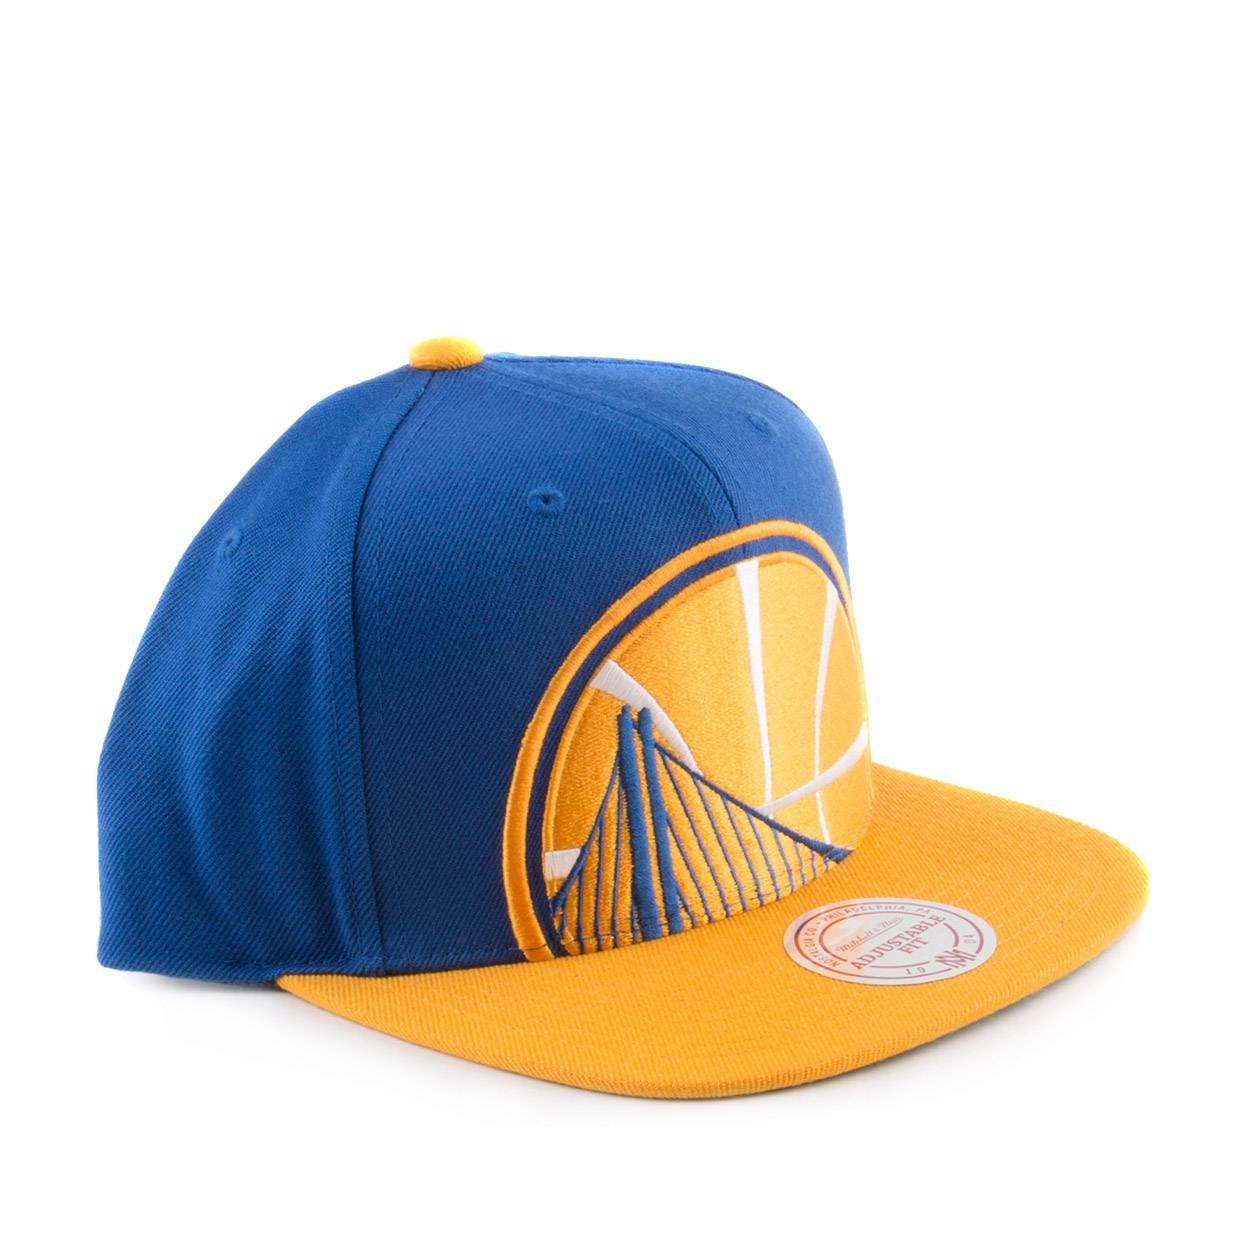 the best attitude 313e5 c9c0b Amazon.com   Mitchell   Ness NBA Cropped XL Logo Adjustable Snapback Hat  (One Size, Boston Celtics)   Clothing